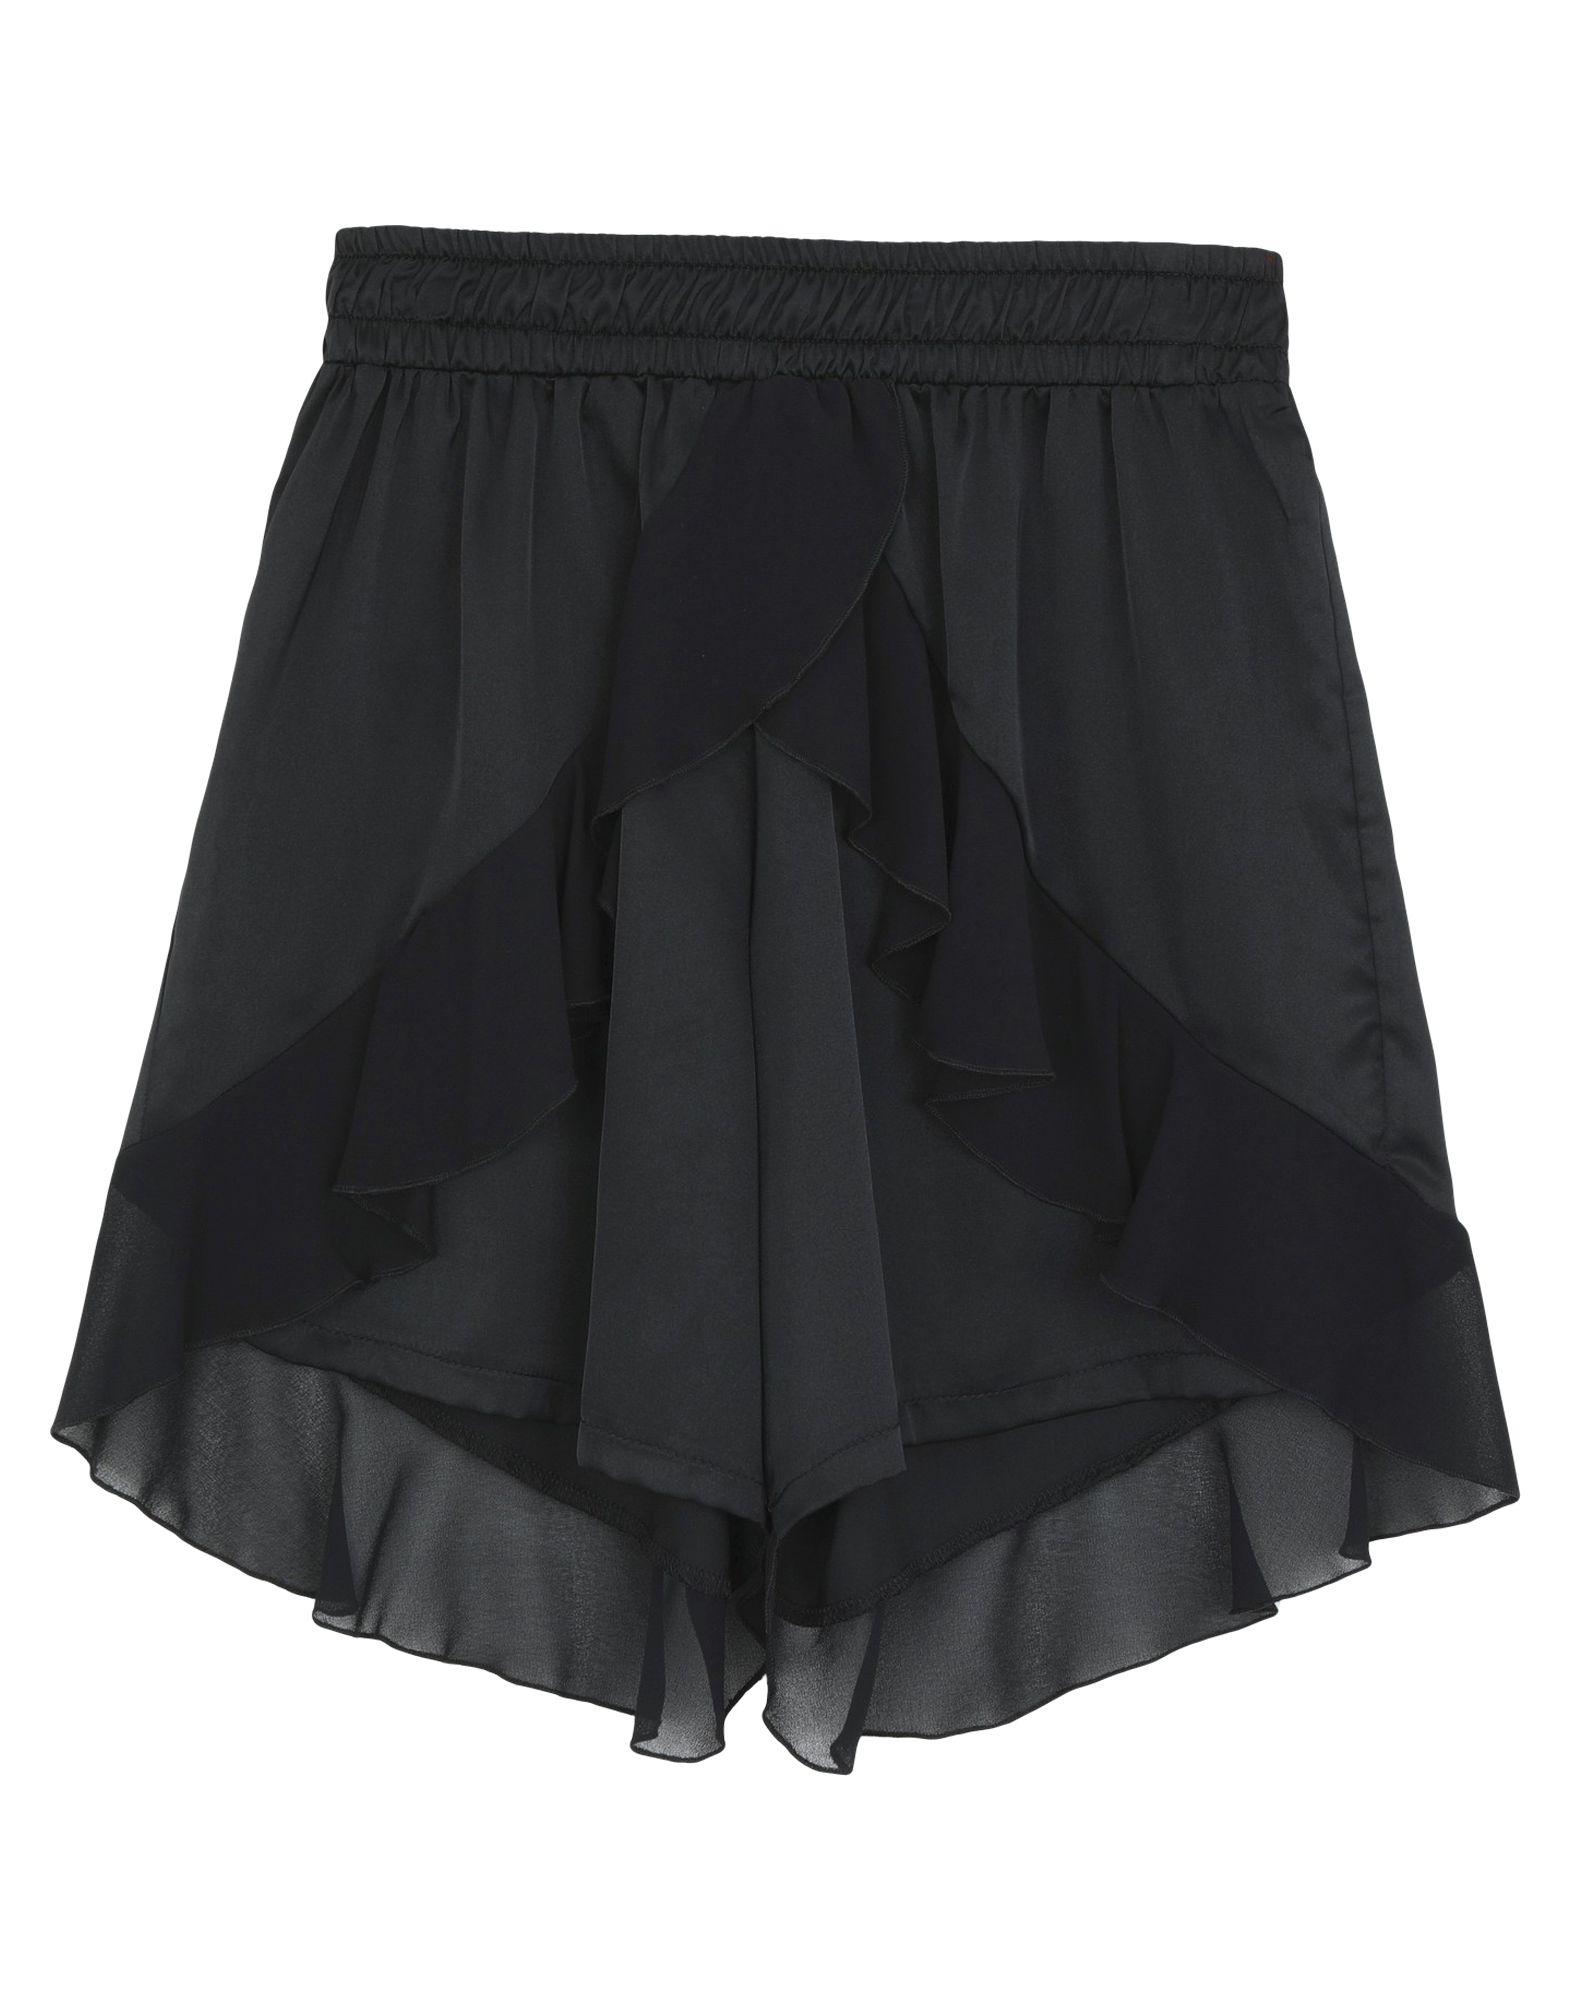 REVISE Повседневные шорты fitted quick dry gym long sleeve t shirt